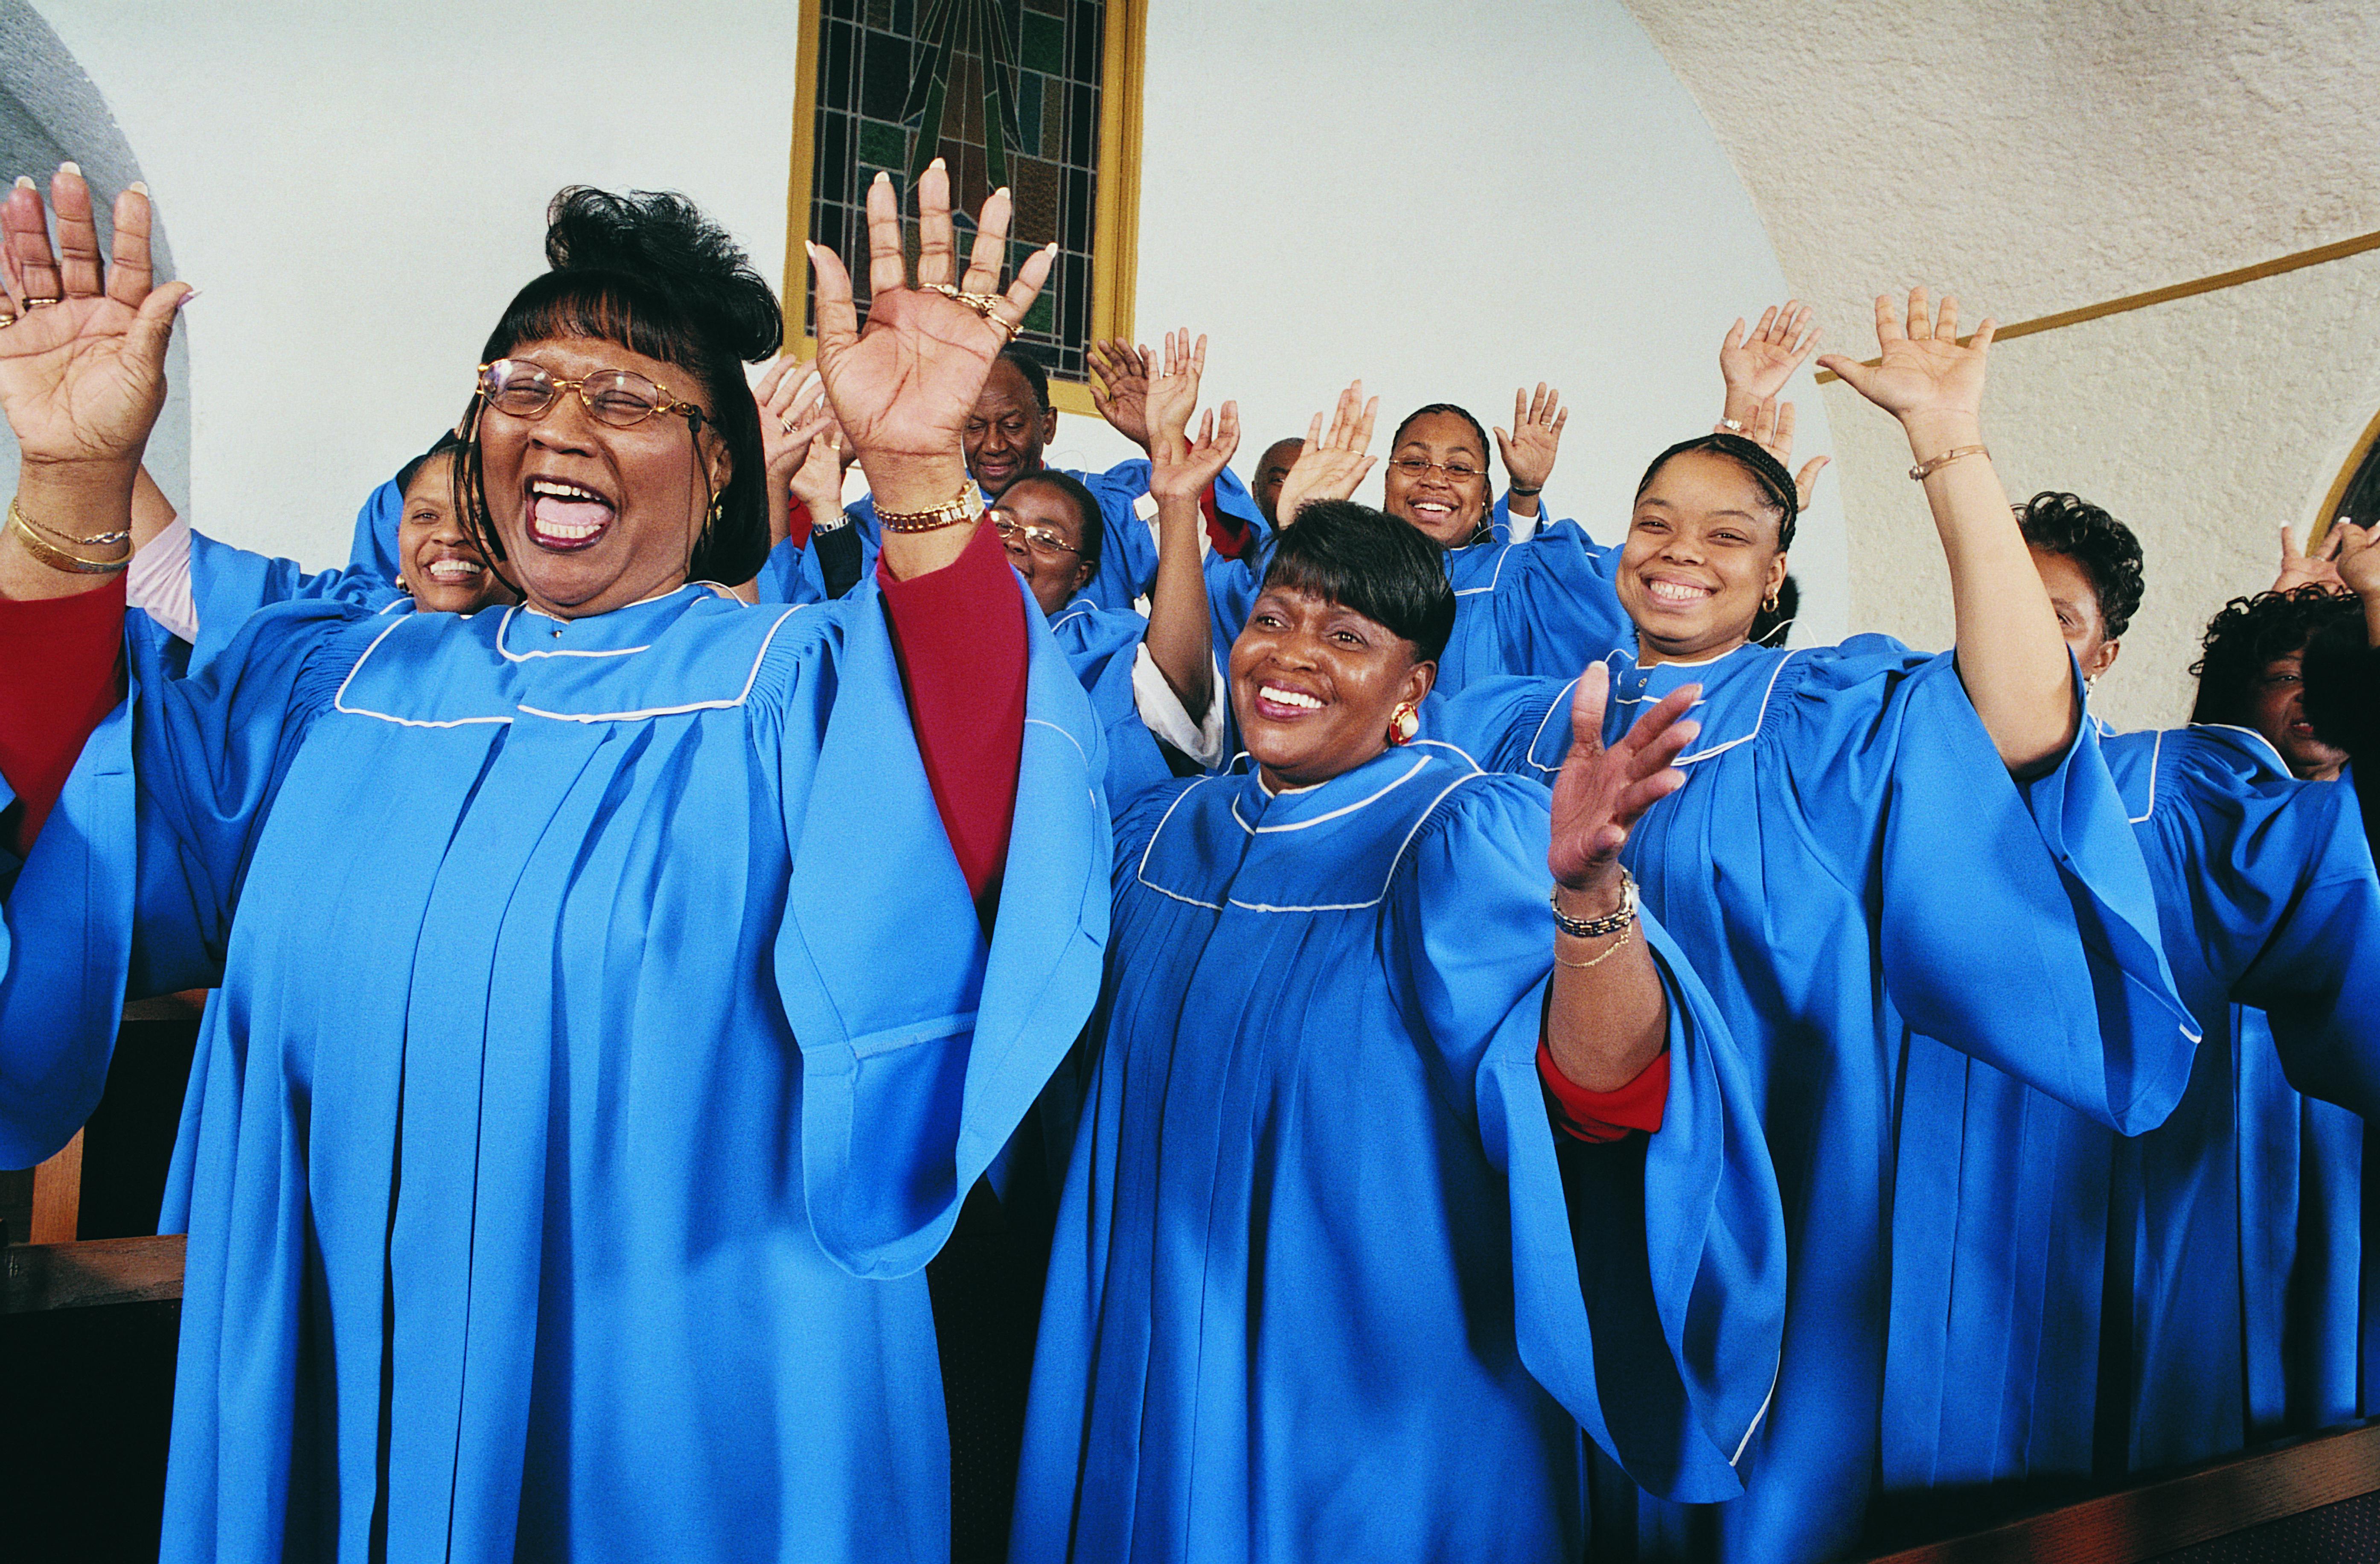 Twelve Gospel Singers With Raised Hands Singing in a Church Service